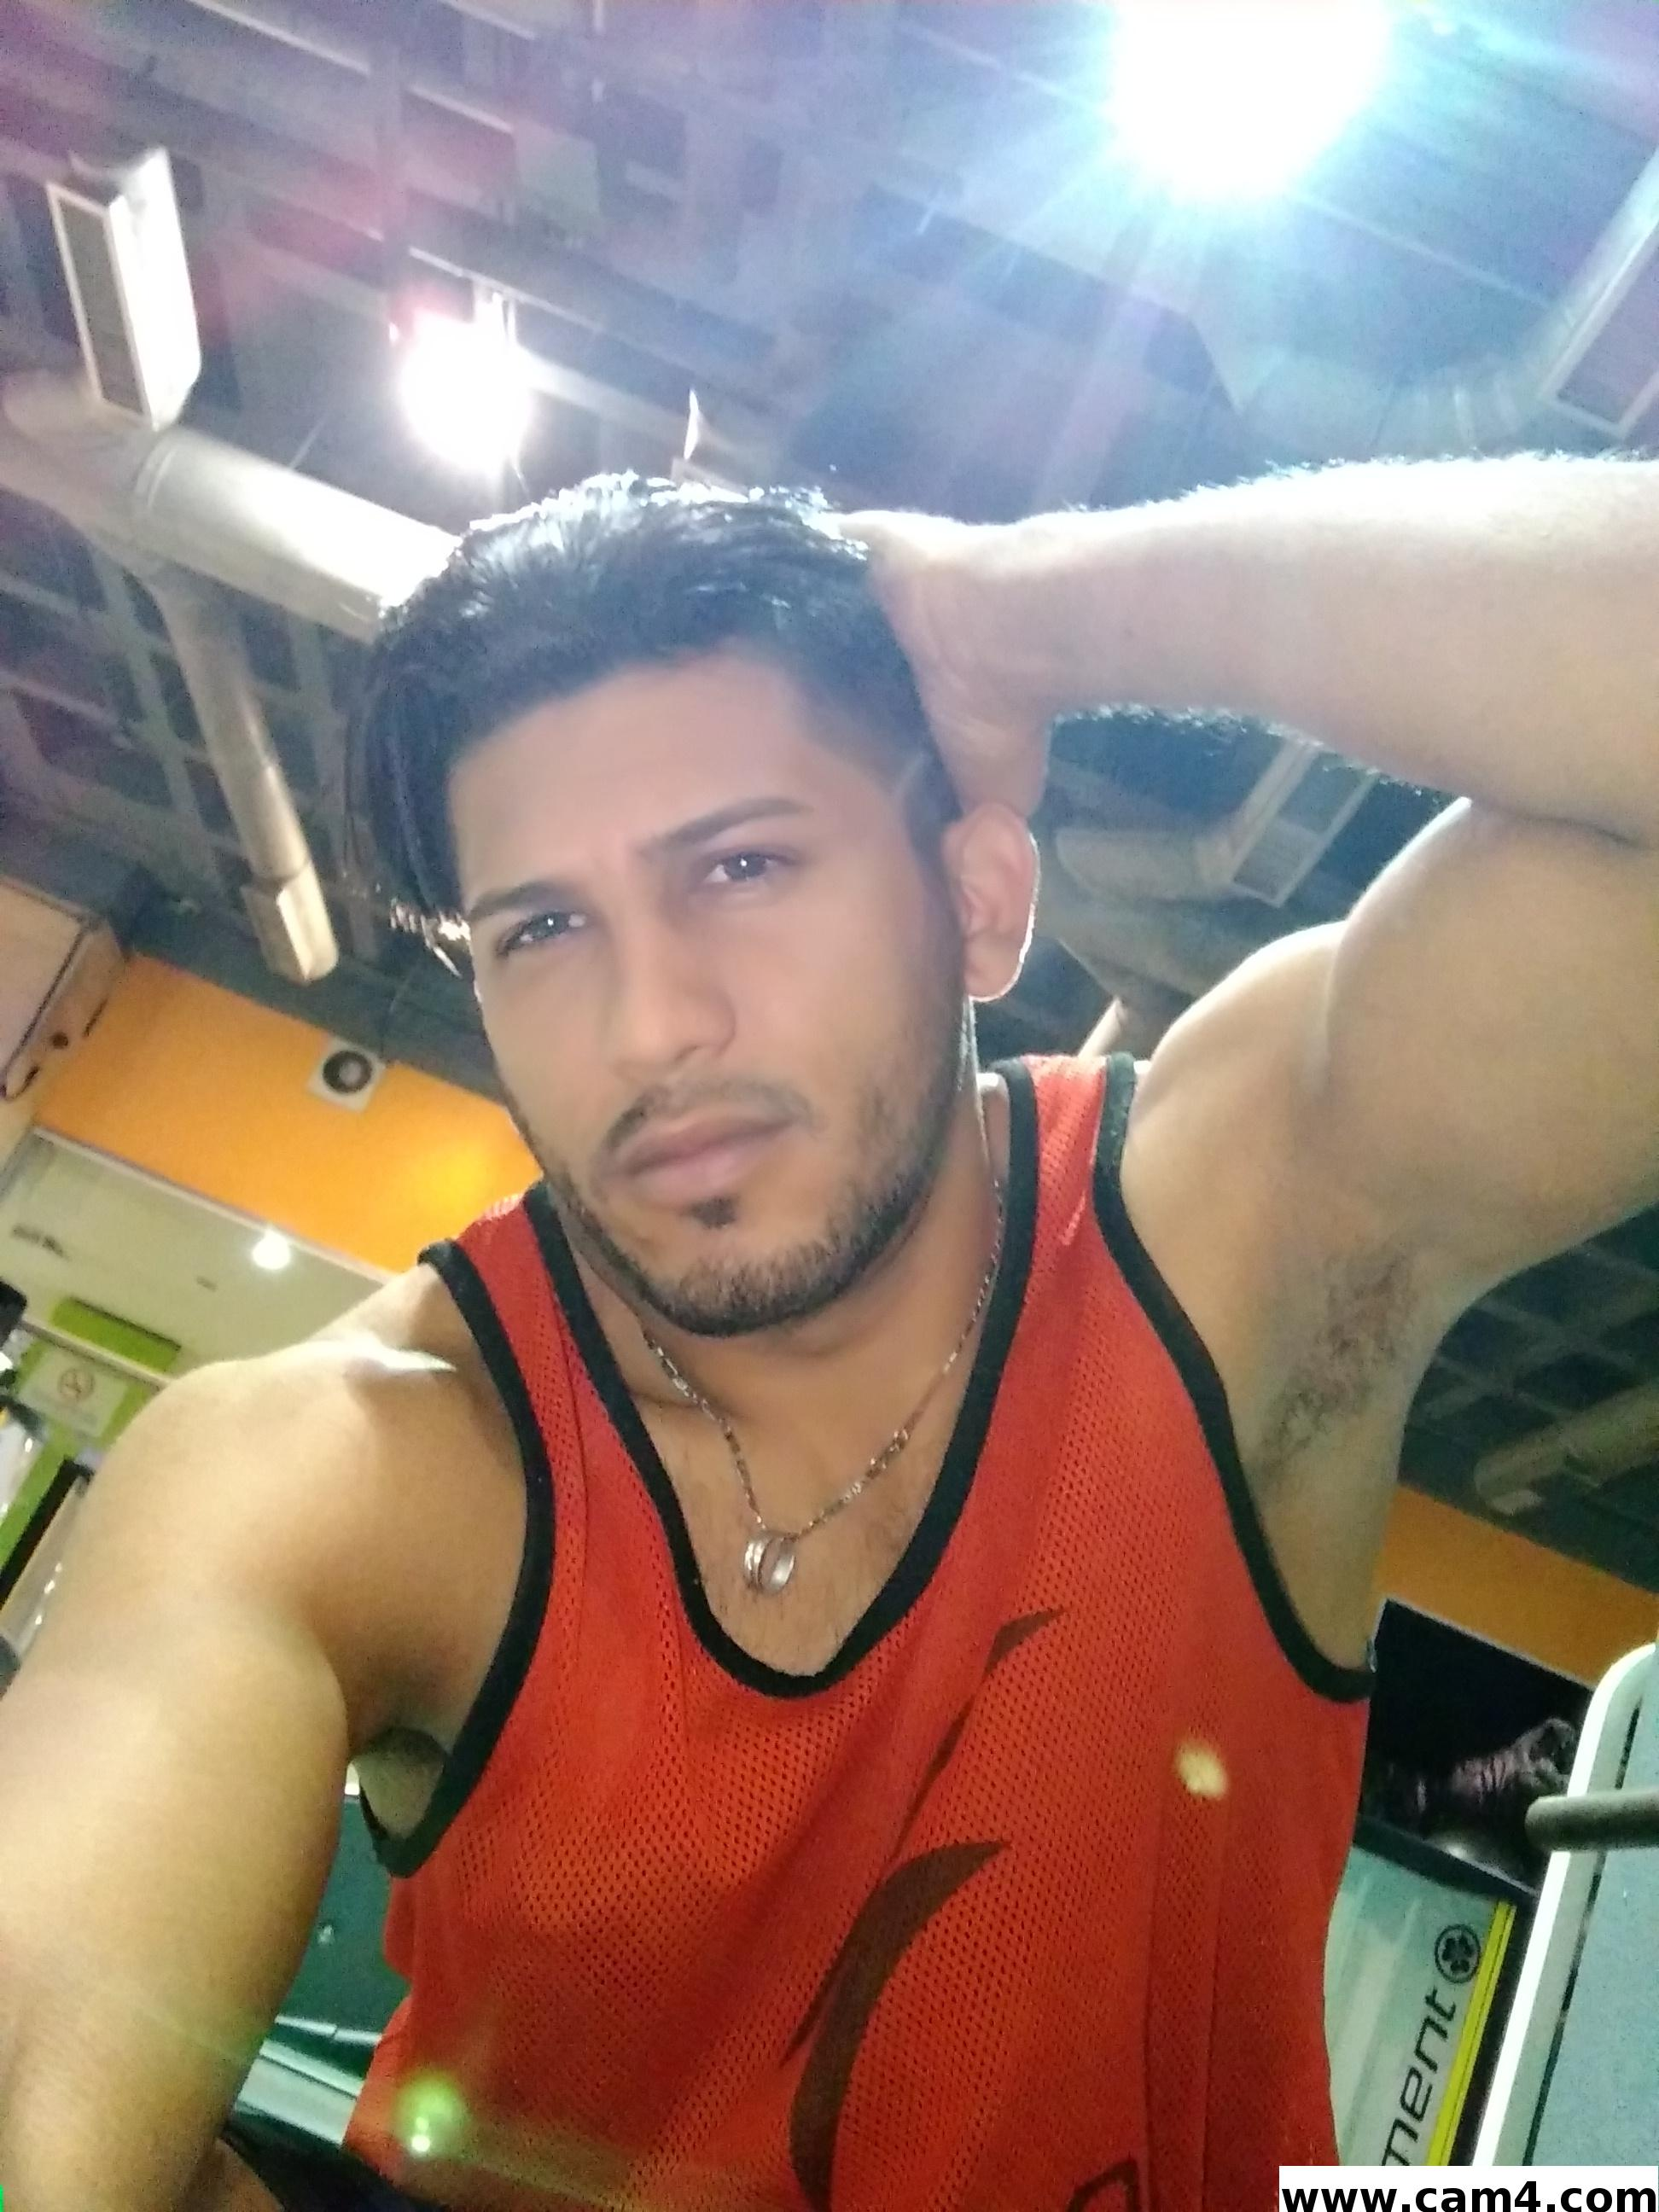 Ricardo0286?s=vkfczdlihwejhq85ilebvgy9cllhrzghrexmdfjw4pi=